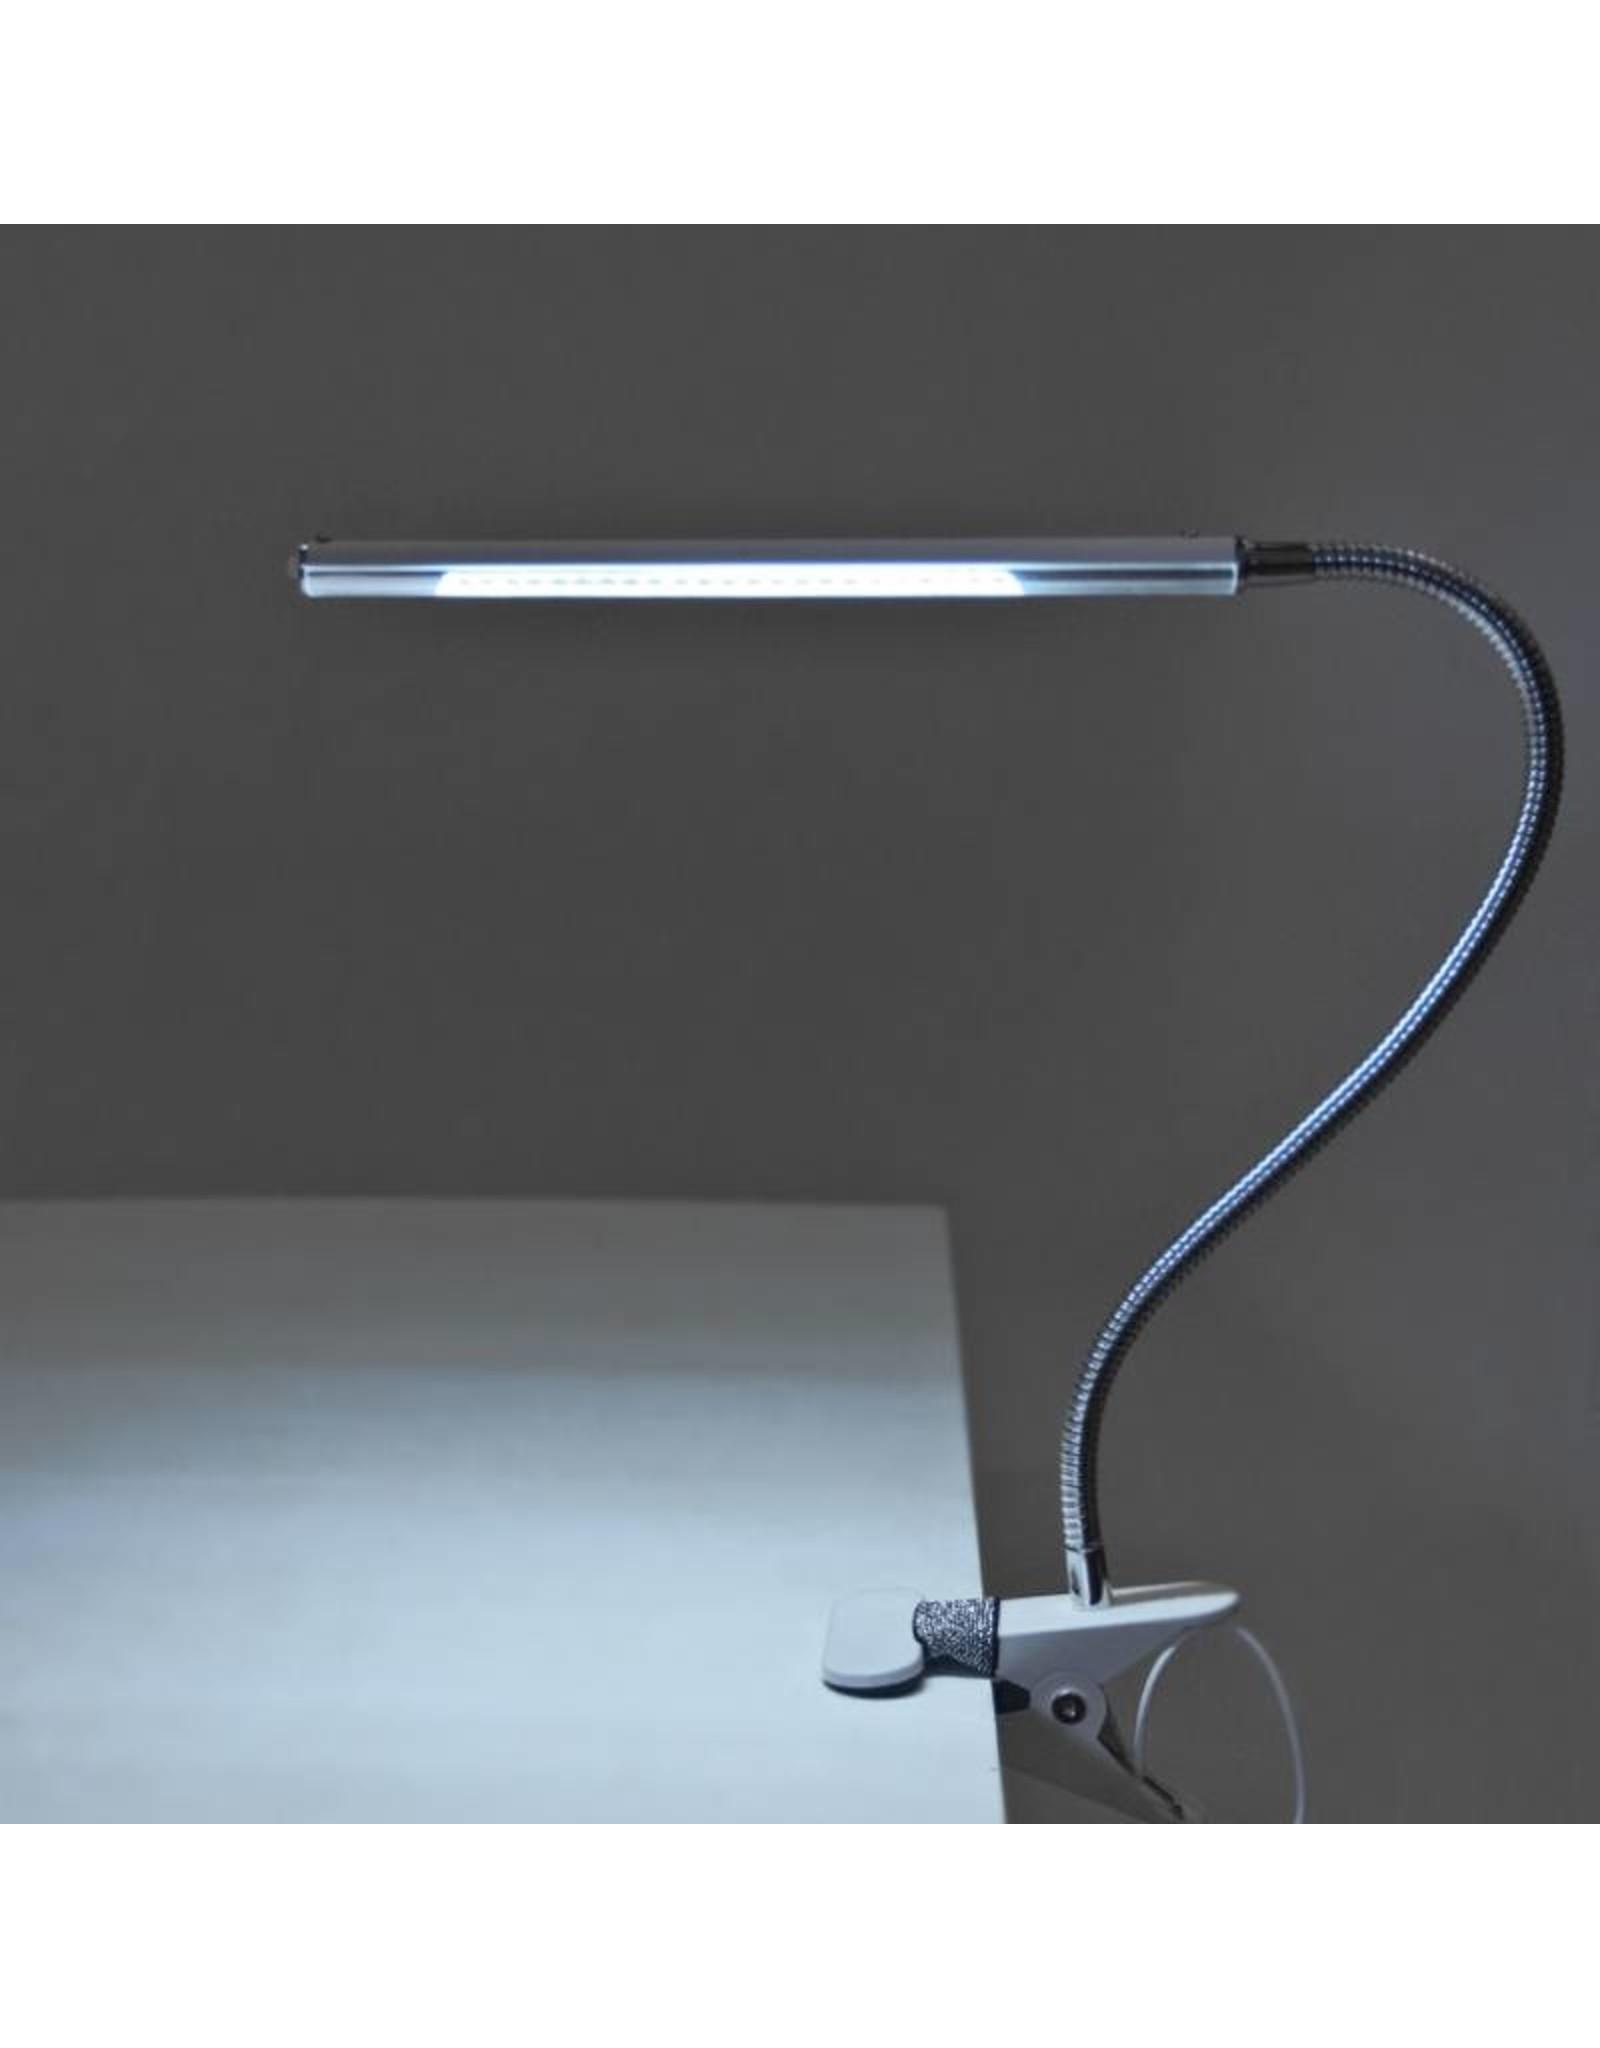 Mega Beauty Shop® LED Tafellamp Goud met een flexibele arm op tafelklem.